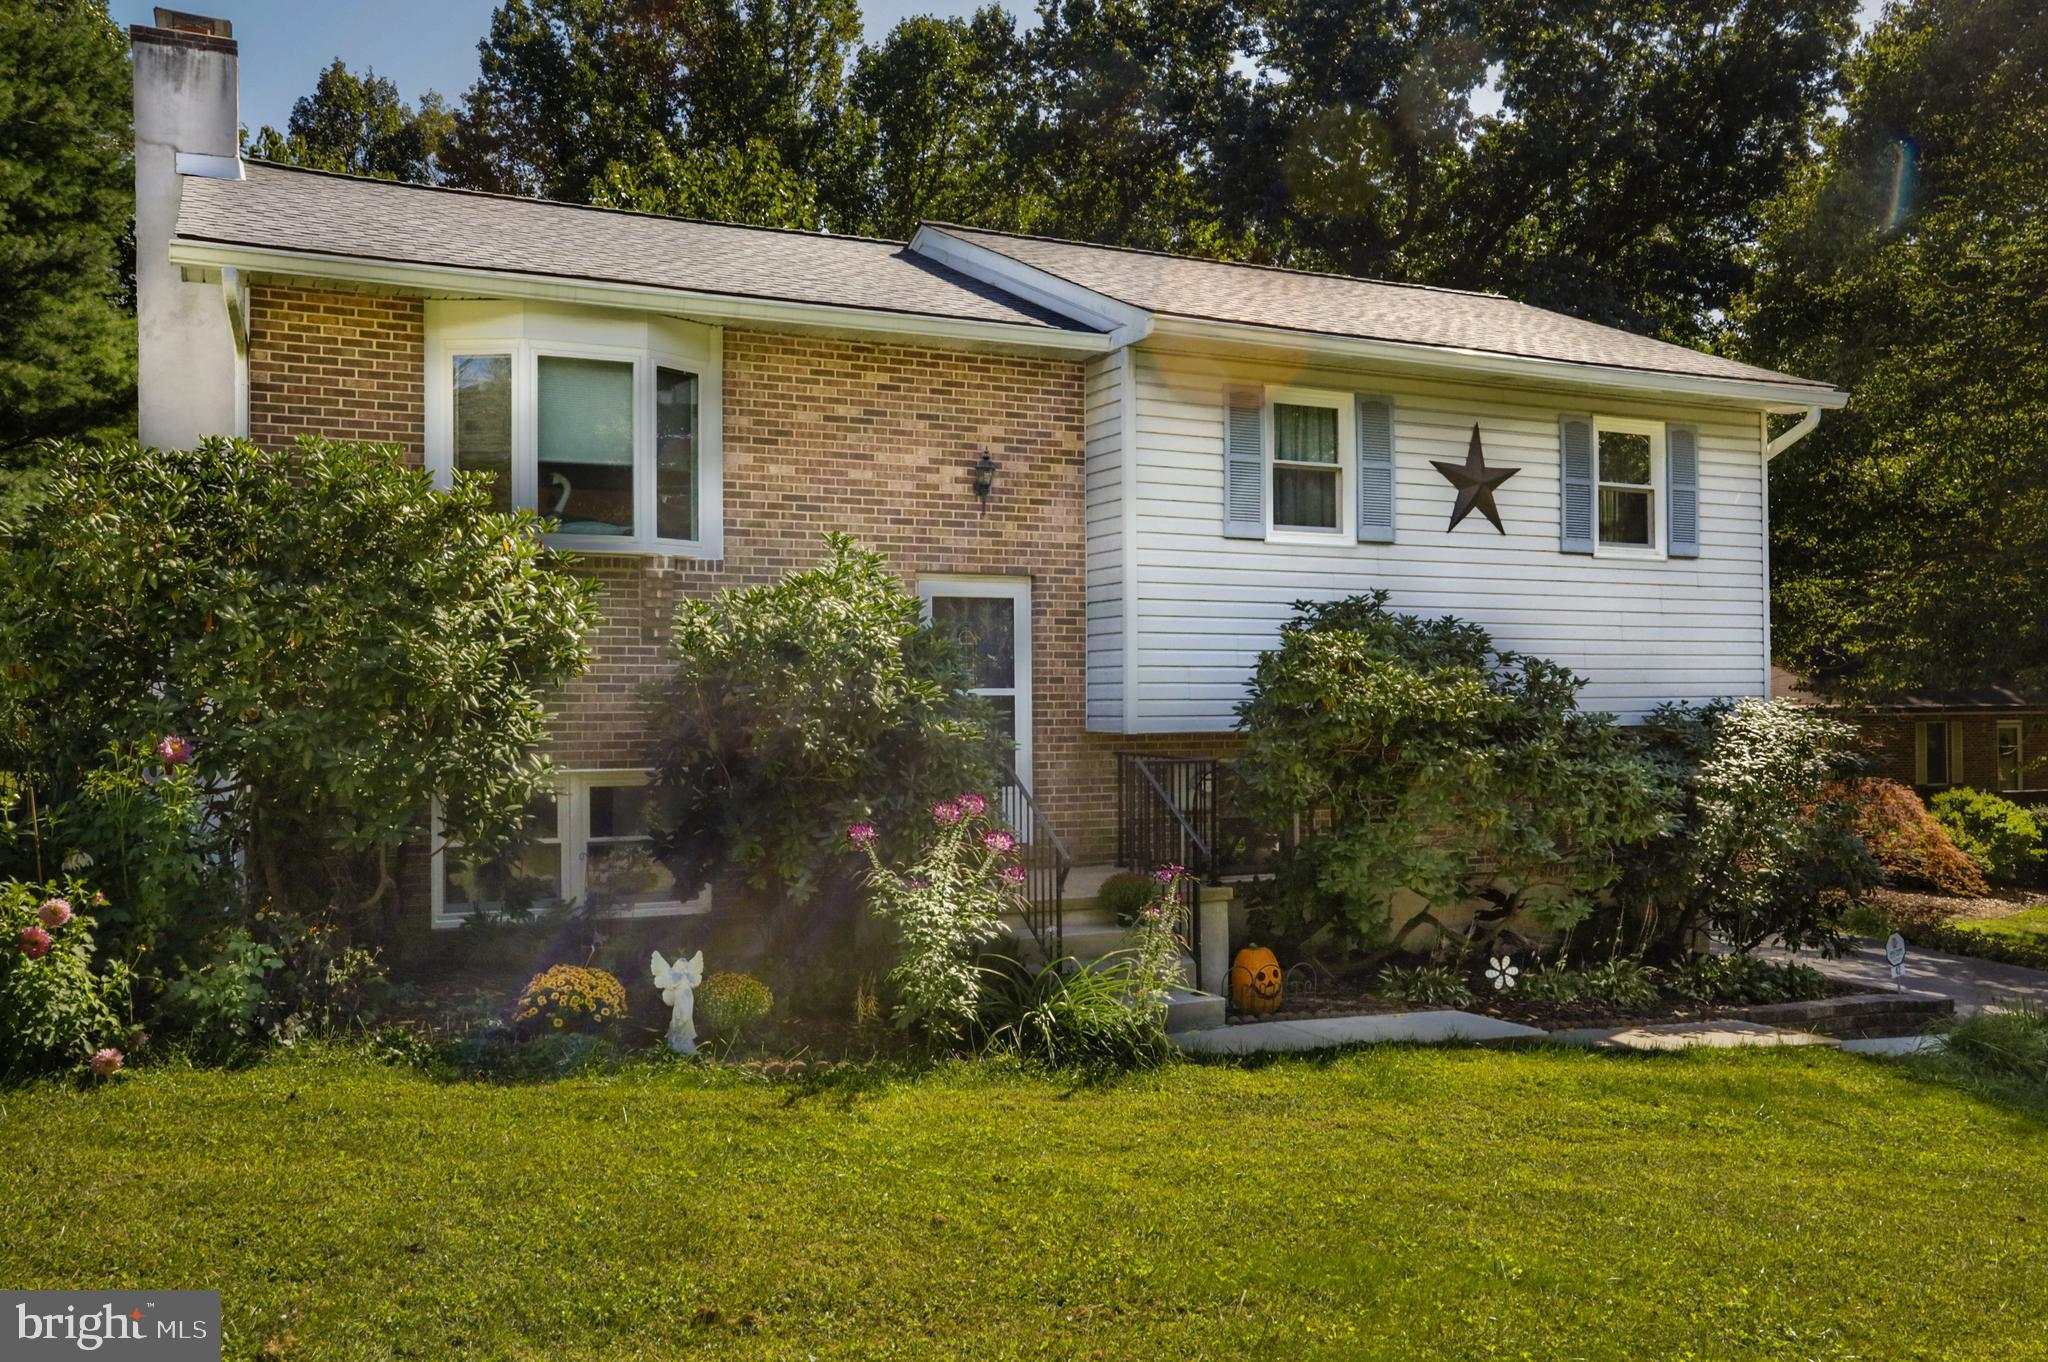 42 Elk Hill Ct, Elkton, MD, 21921